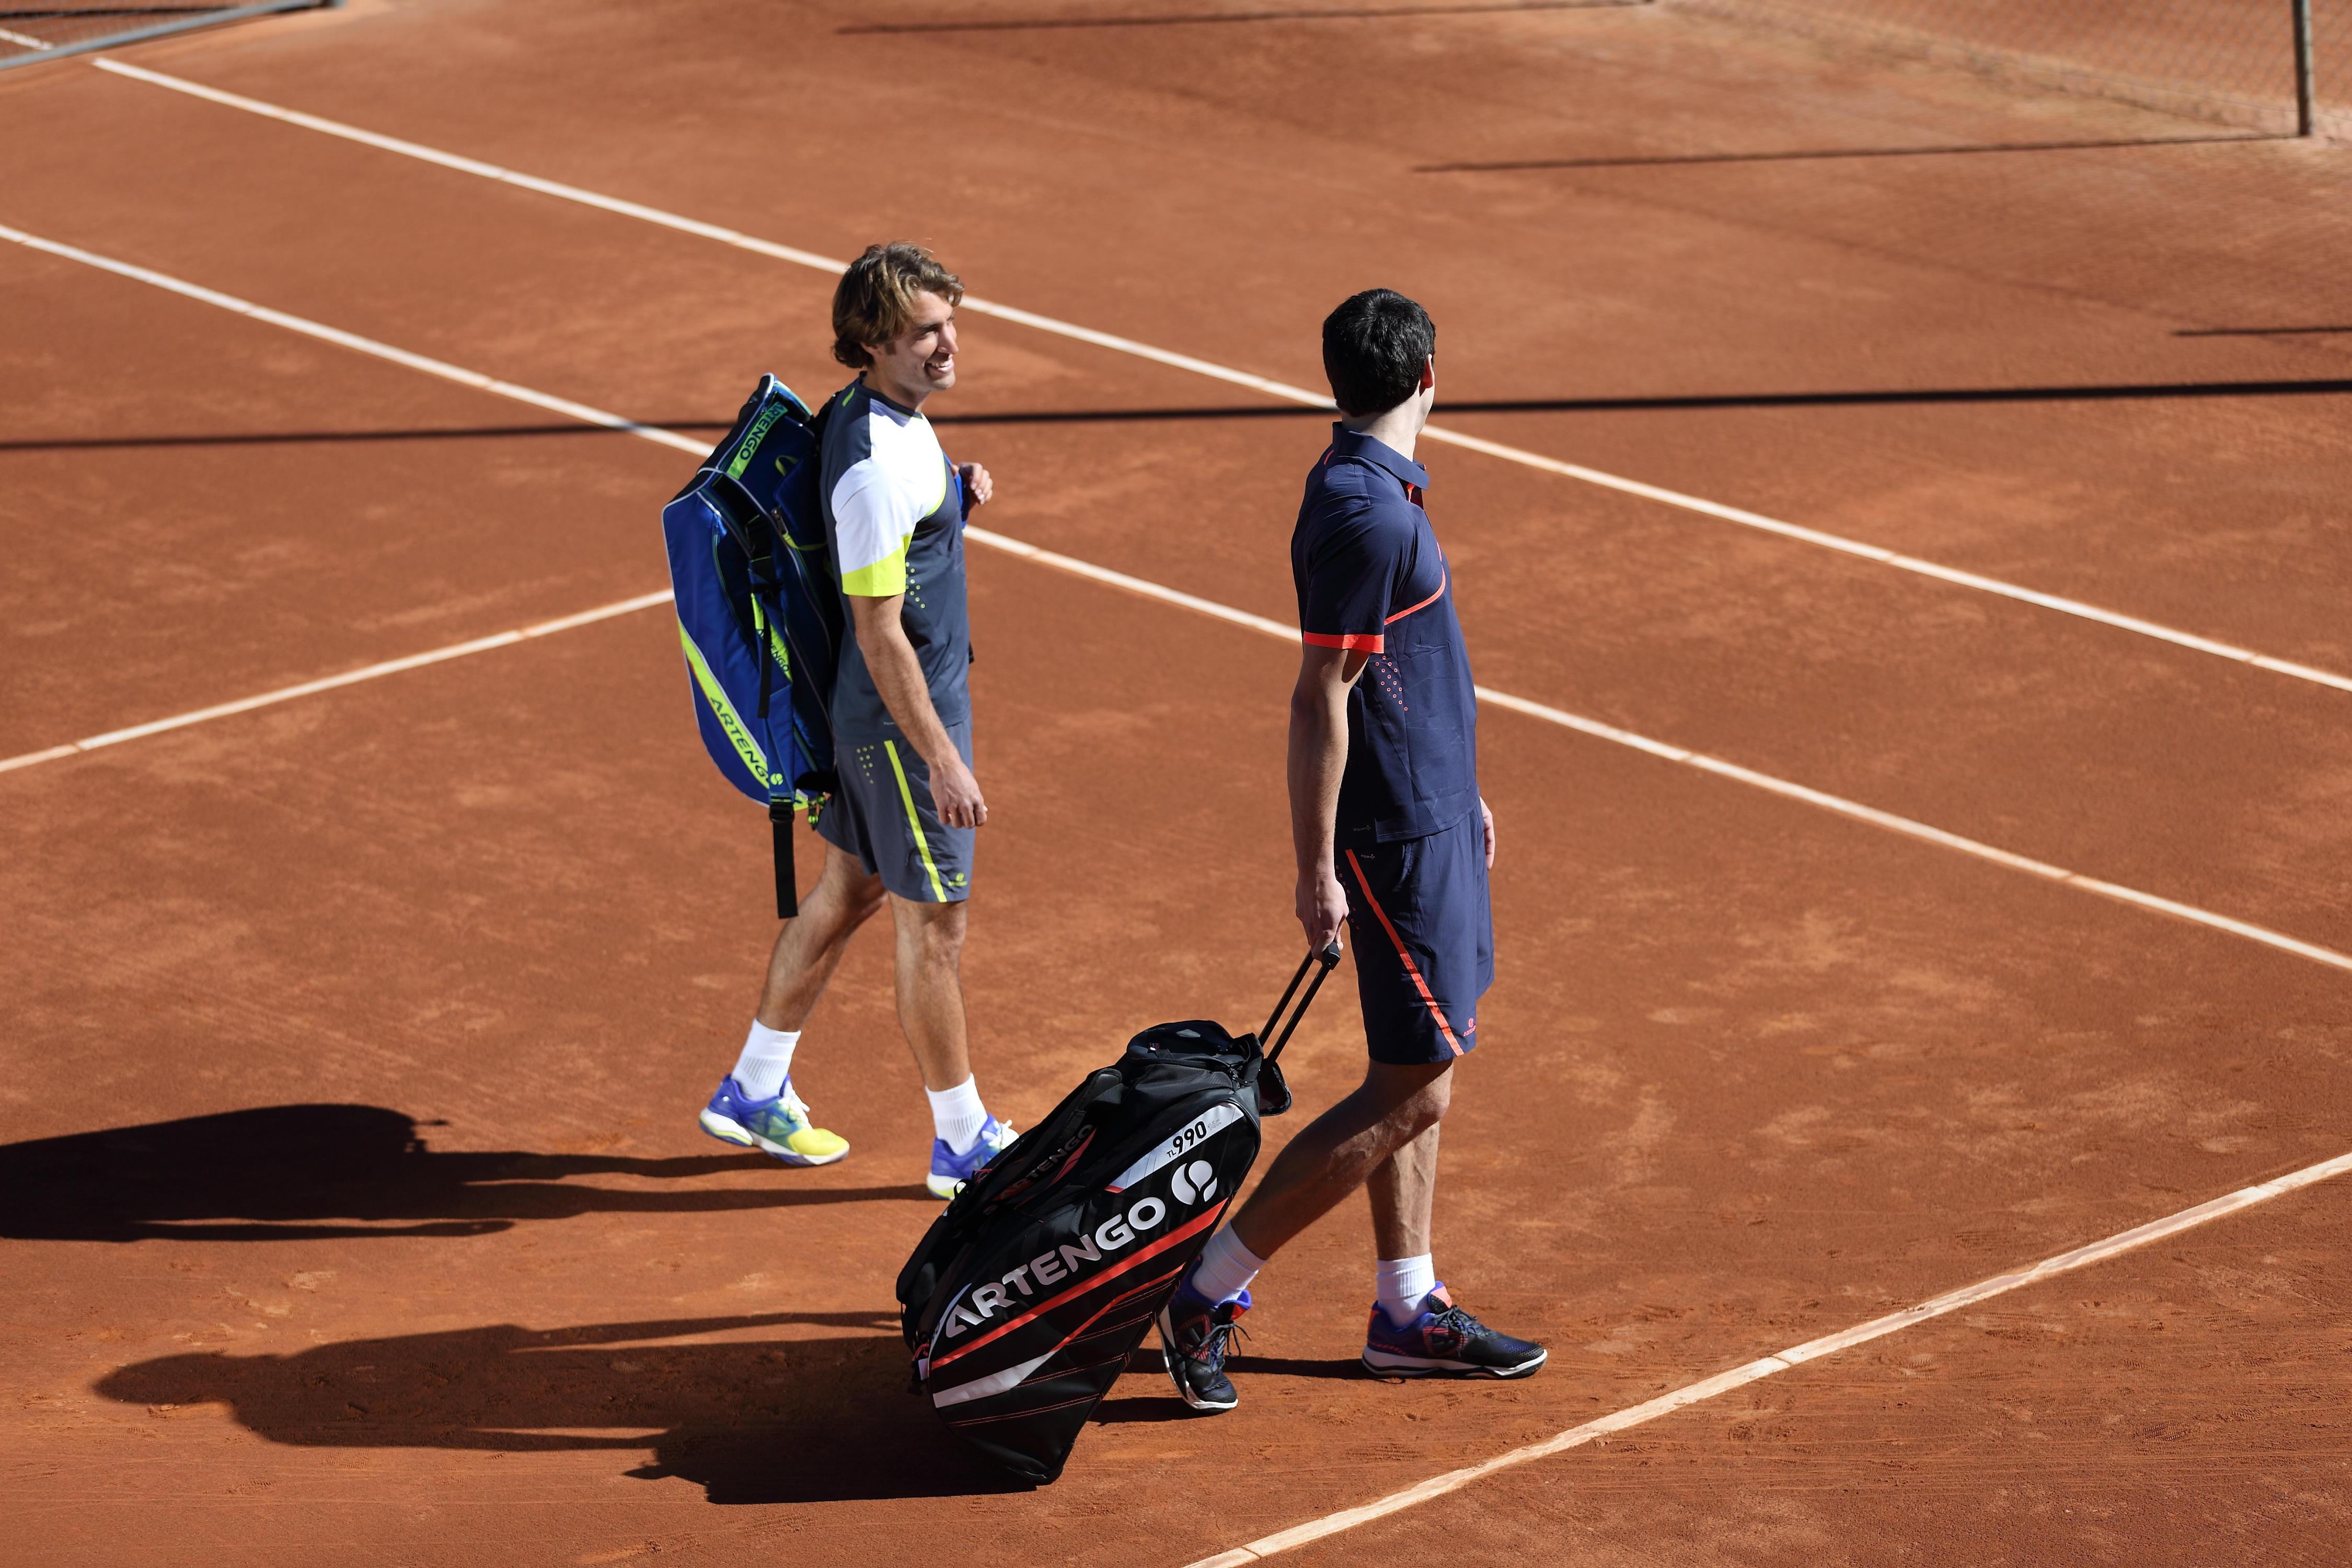 Bag Badminton/Tennis/Squash - Black/Coral